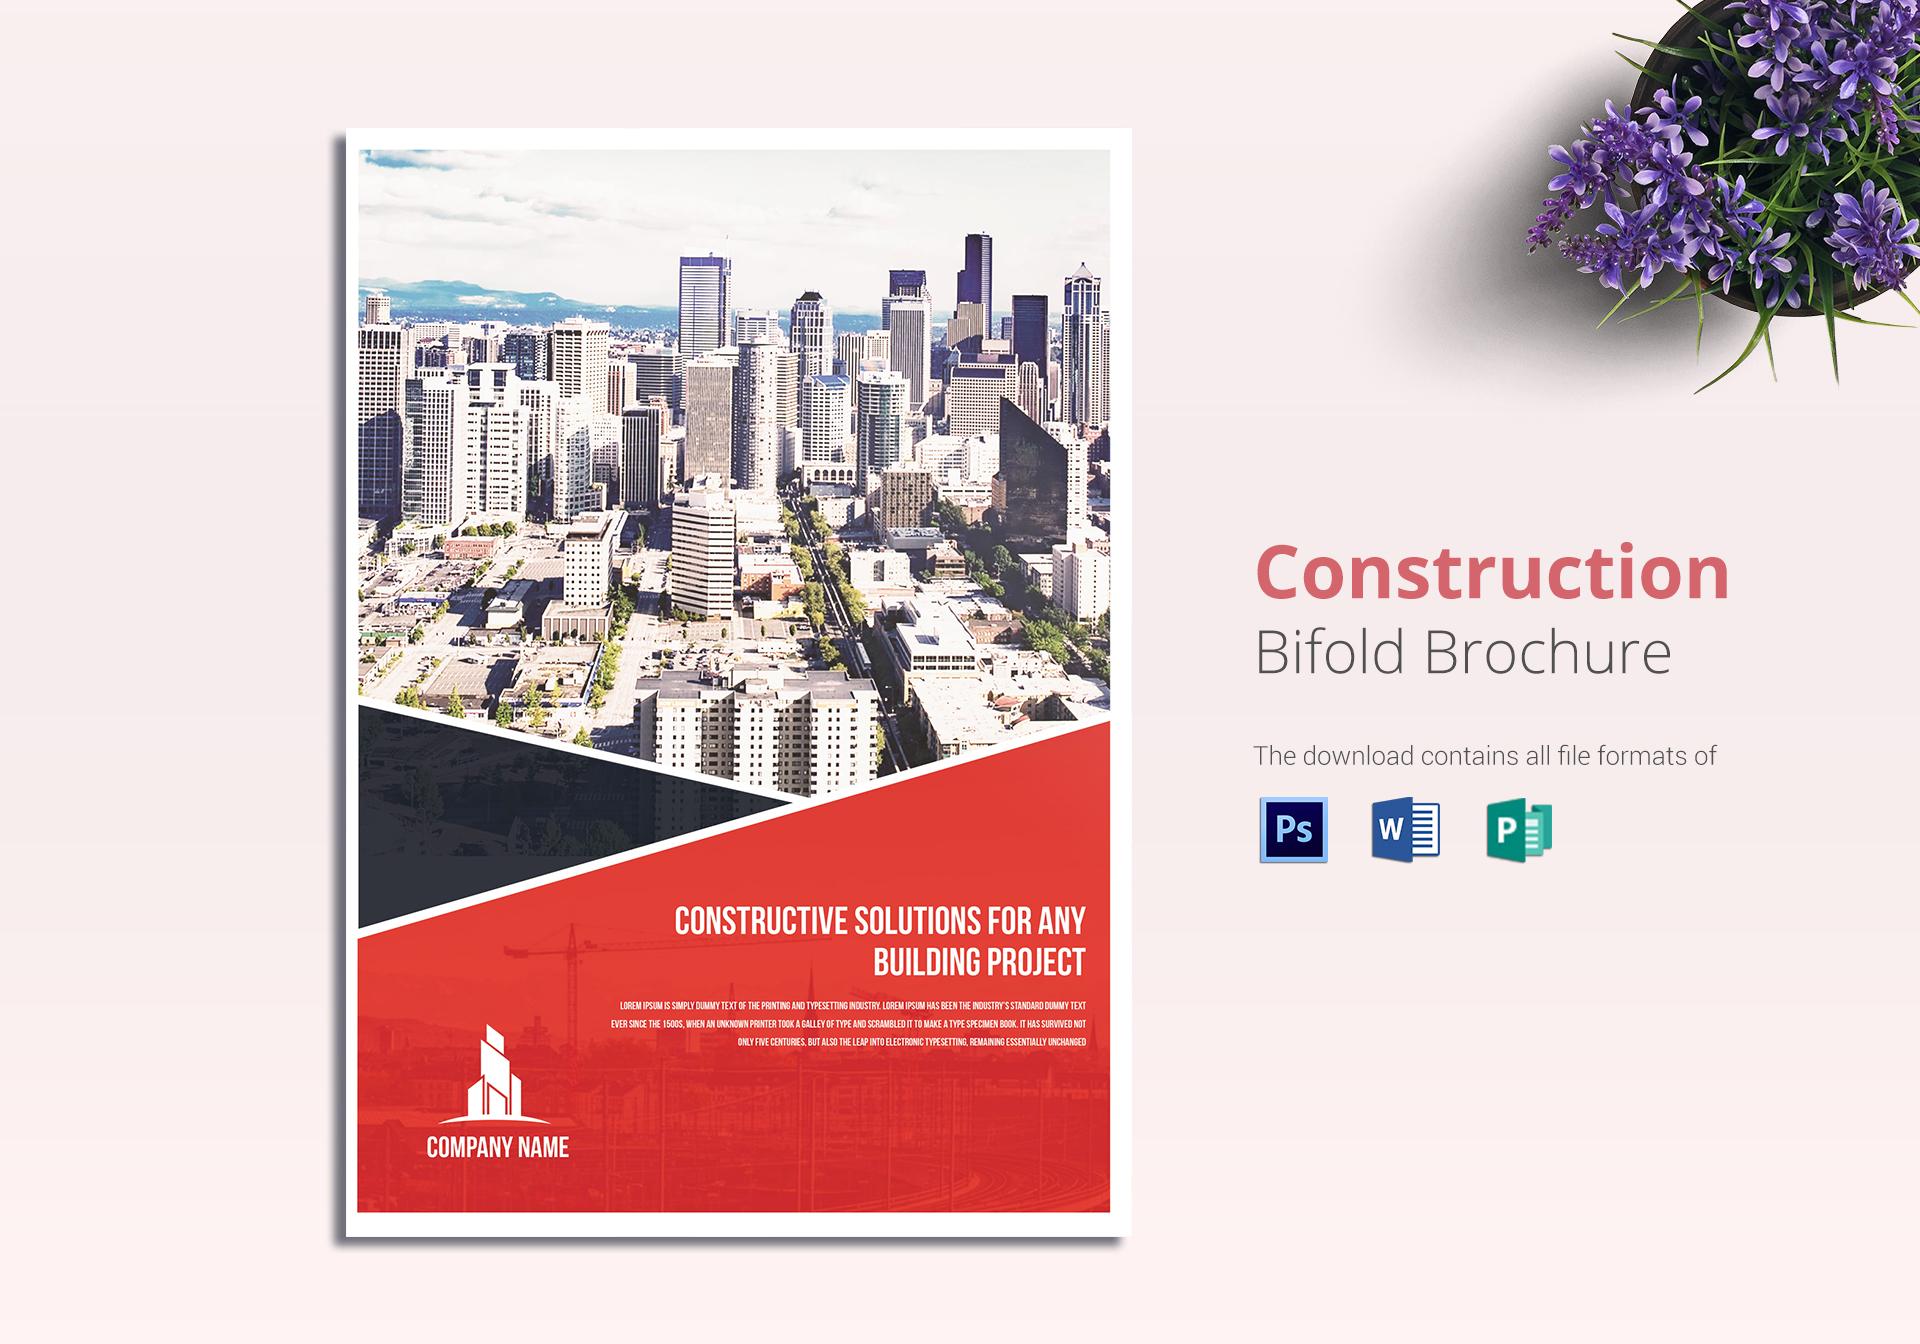 construction solutions bifold brochure template